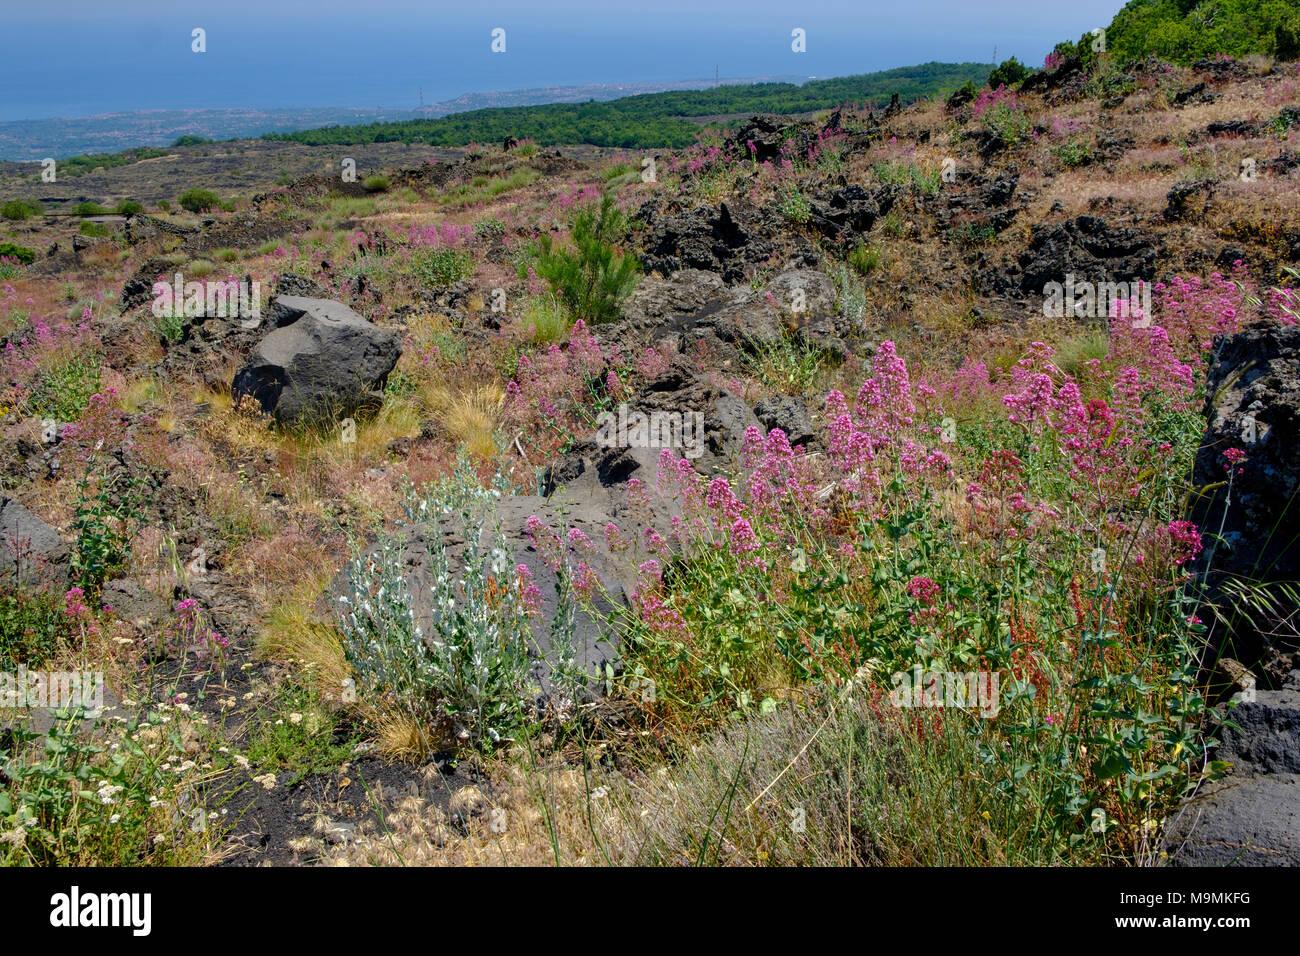 Flowering vegetation on lava fields, volcano Etna, Via Etna, province of Catania, Silzilia, Italy - Stock Image